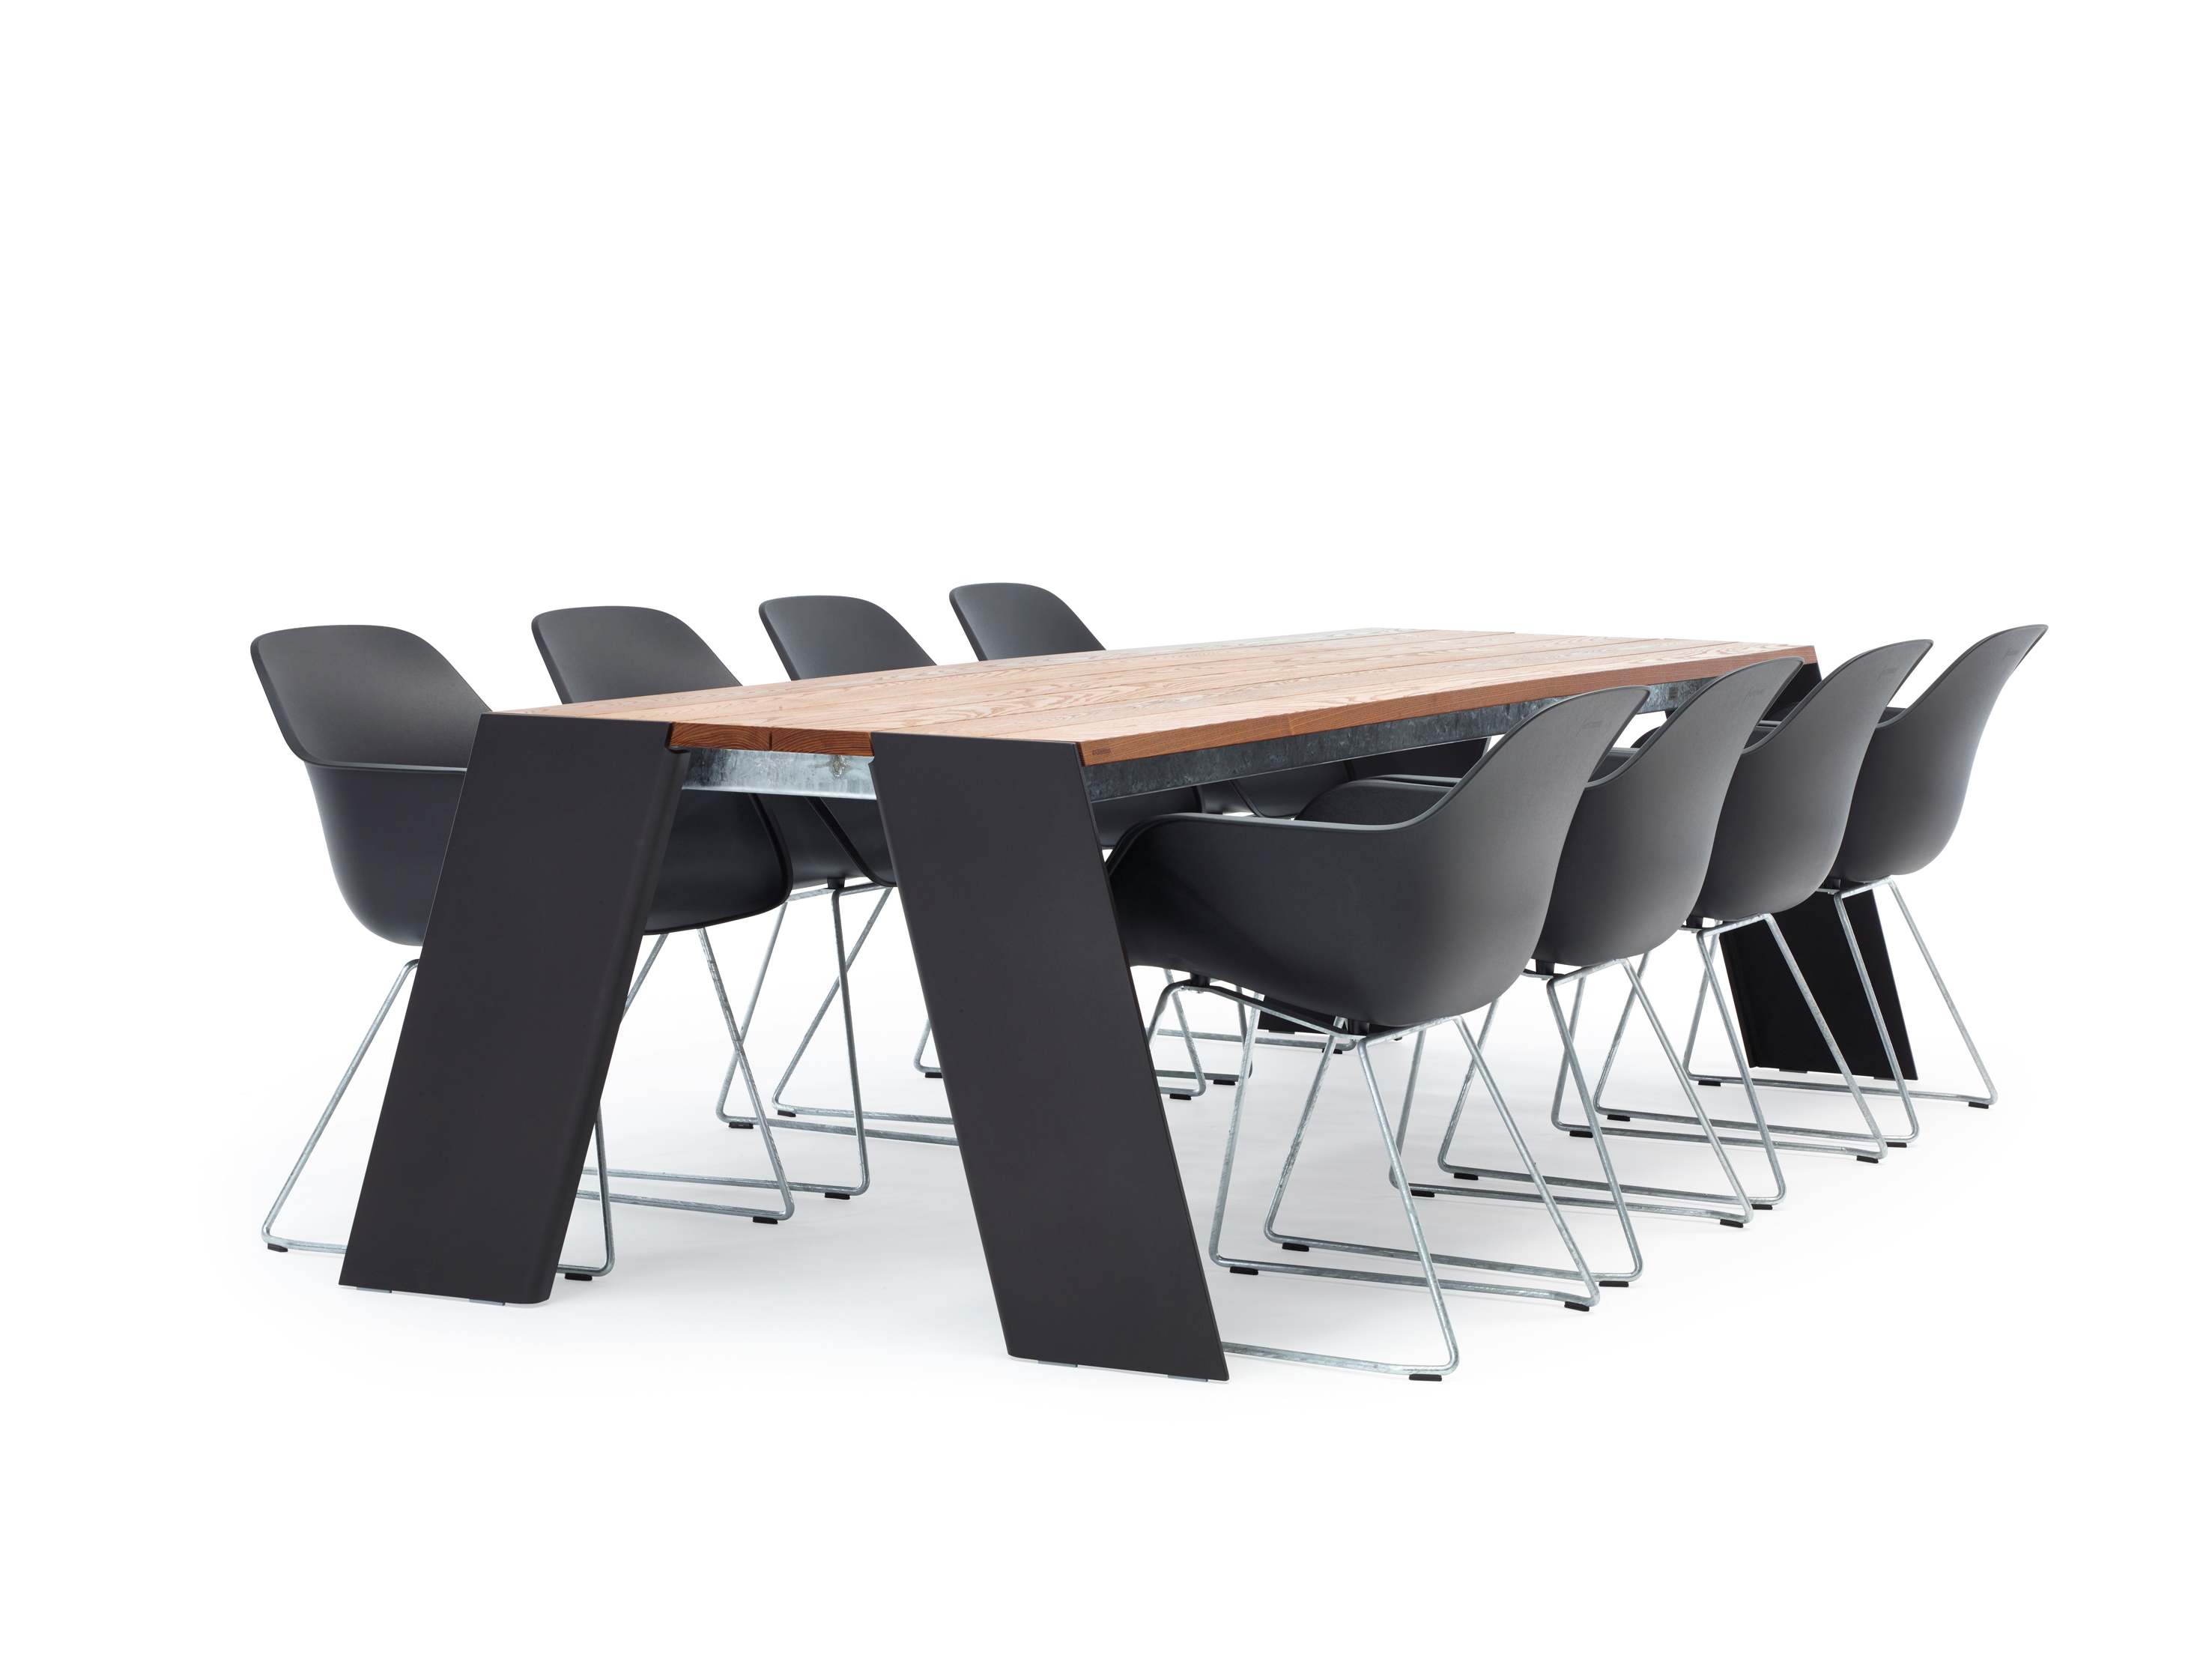 Hopper Table Dirk Wynants Extremis Orangeskin